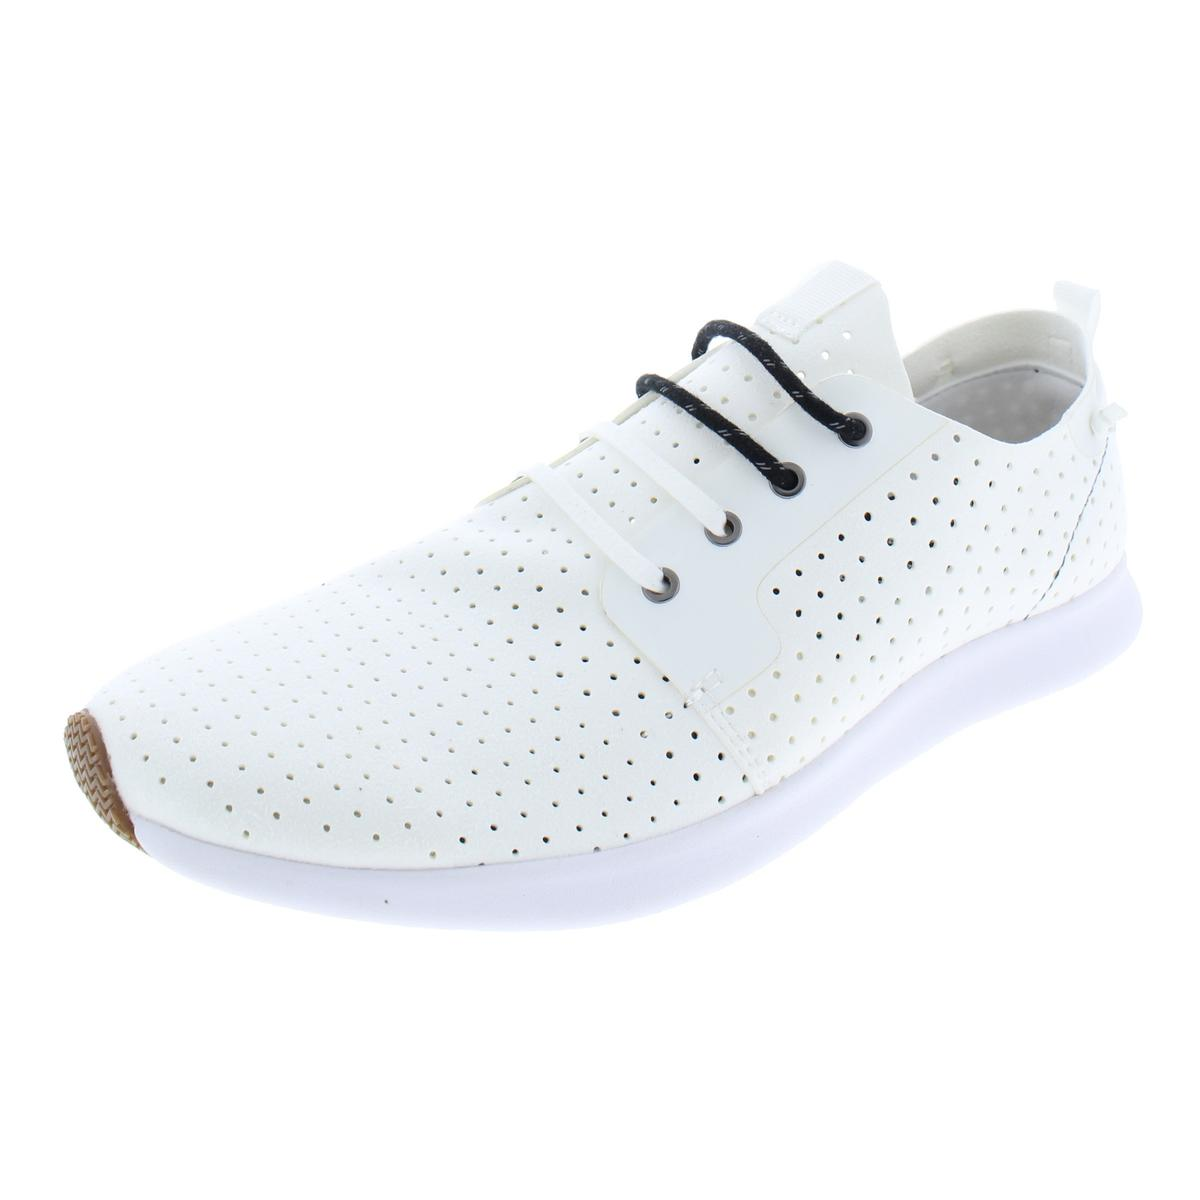 db066abeb3c Details about Steve Madden Mens Brick White Fashion Sneakers Shoes 9 Medium  (D) BHFO 6778